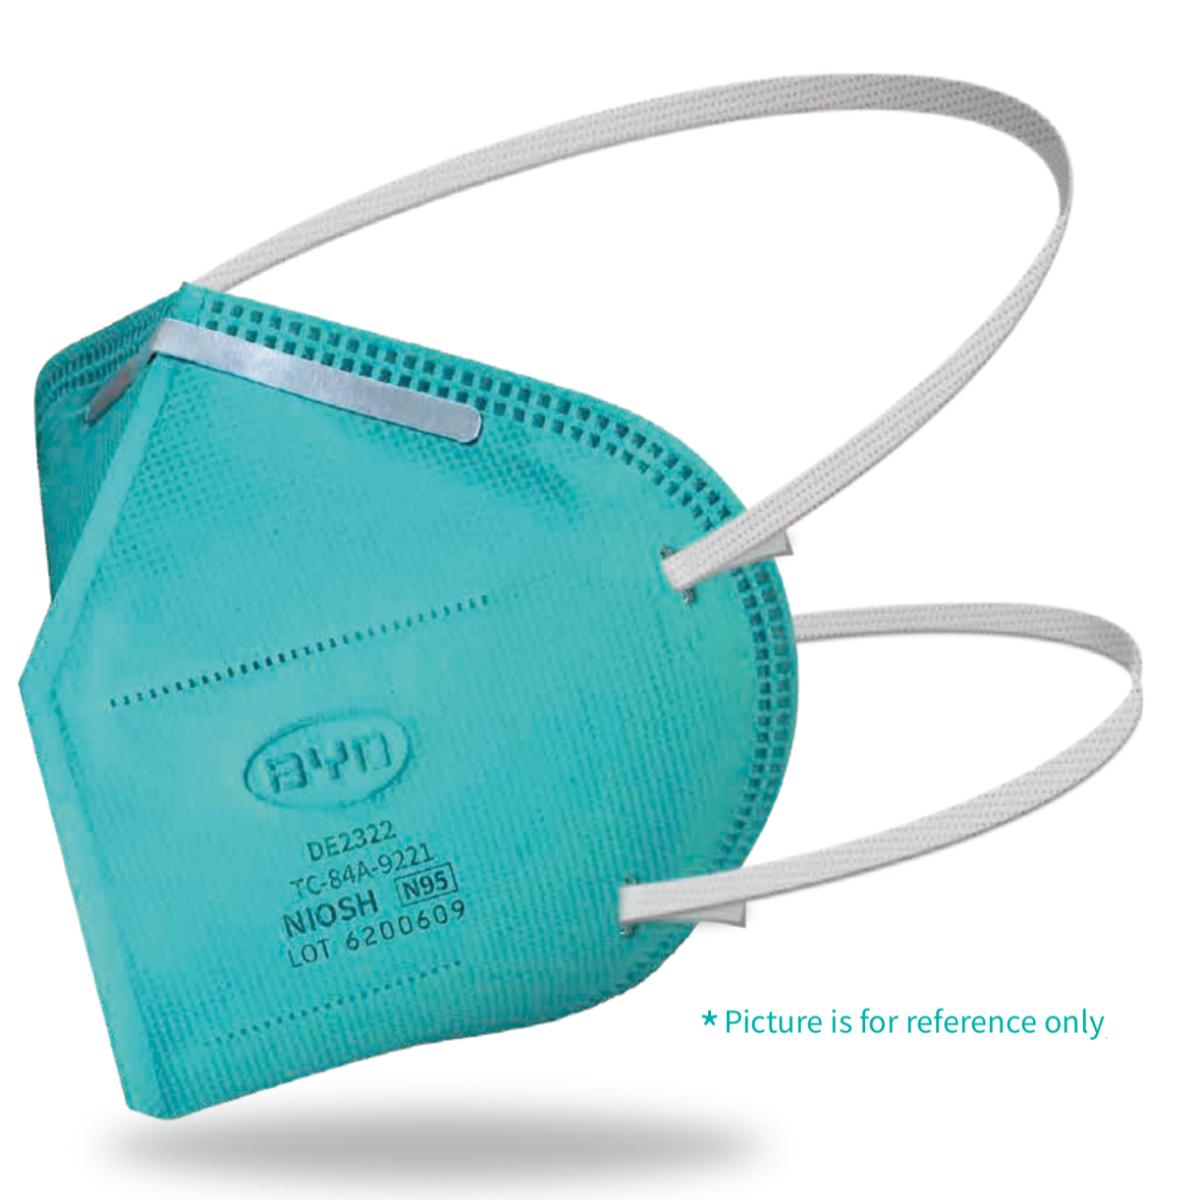 N95 Respirator Mask, NIOSH-Certified, Box of 20